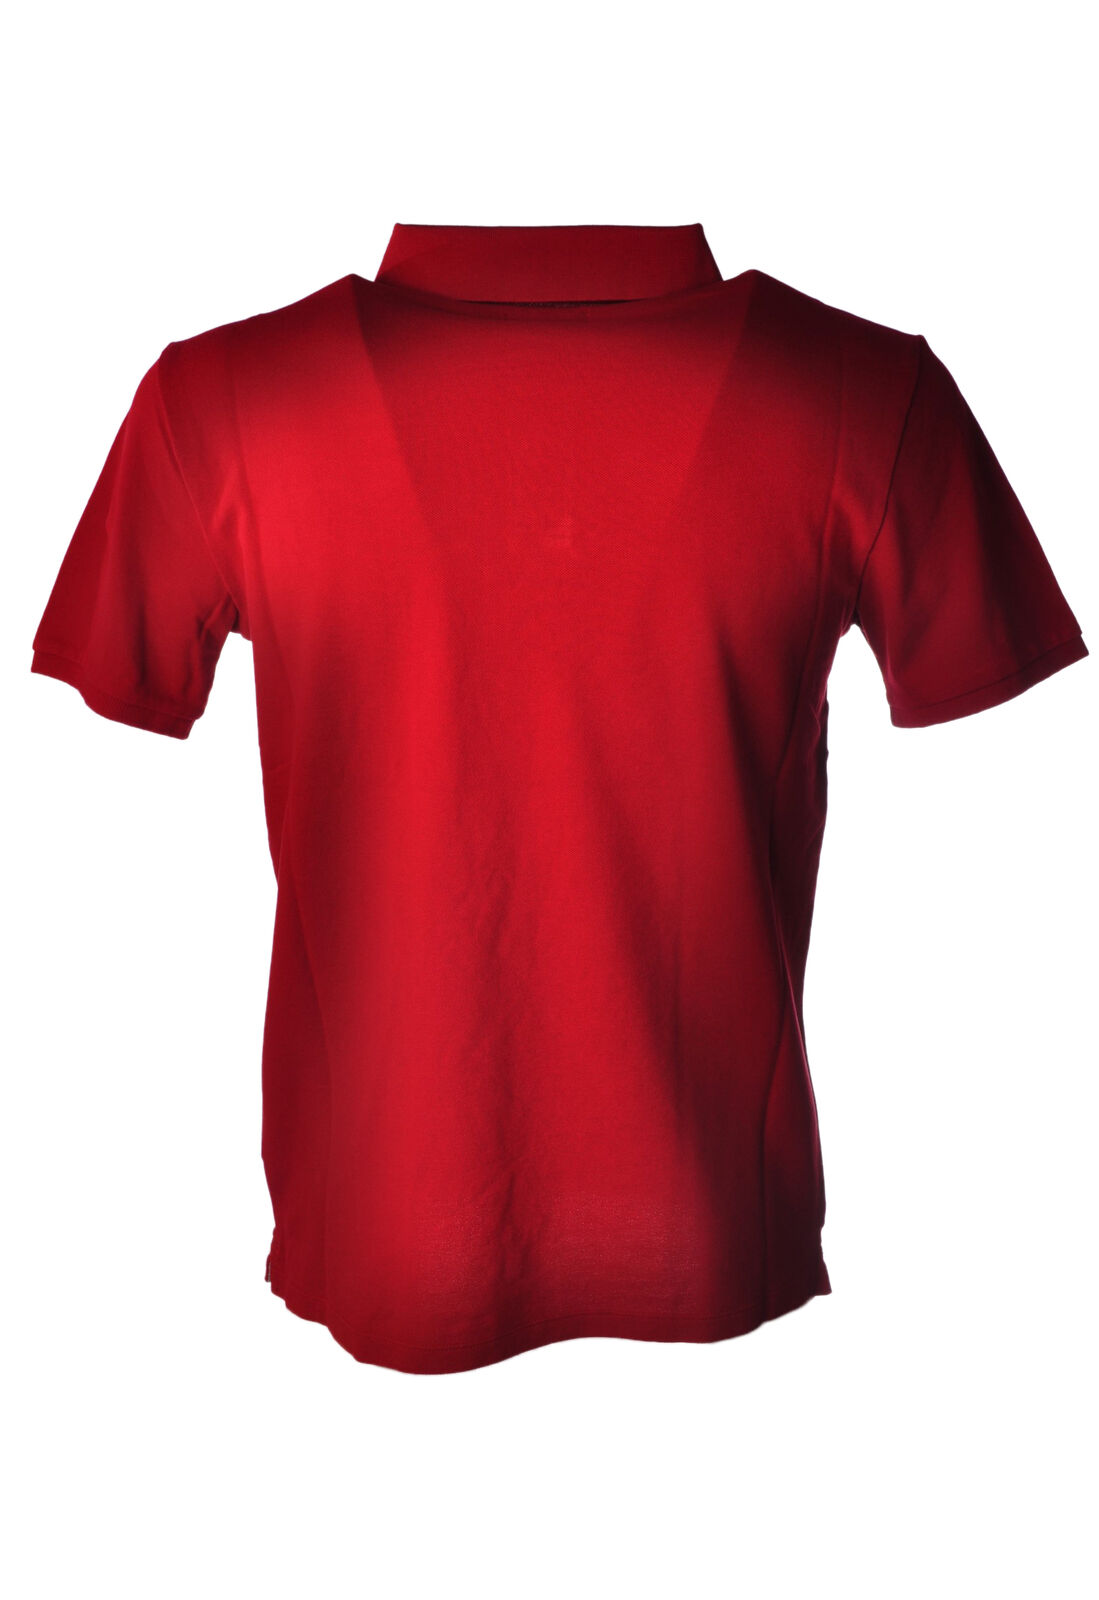 Woolrich - - Topwear-Polo - Woolrich Man - rosso - 5018914H184314 bec1e6